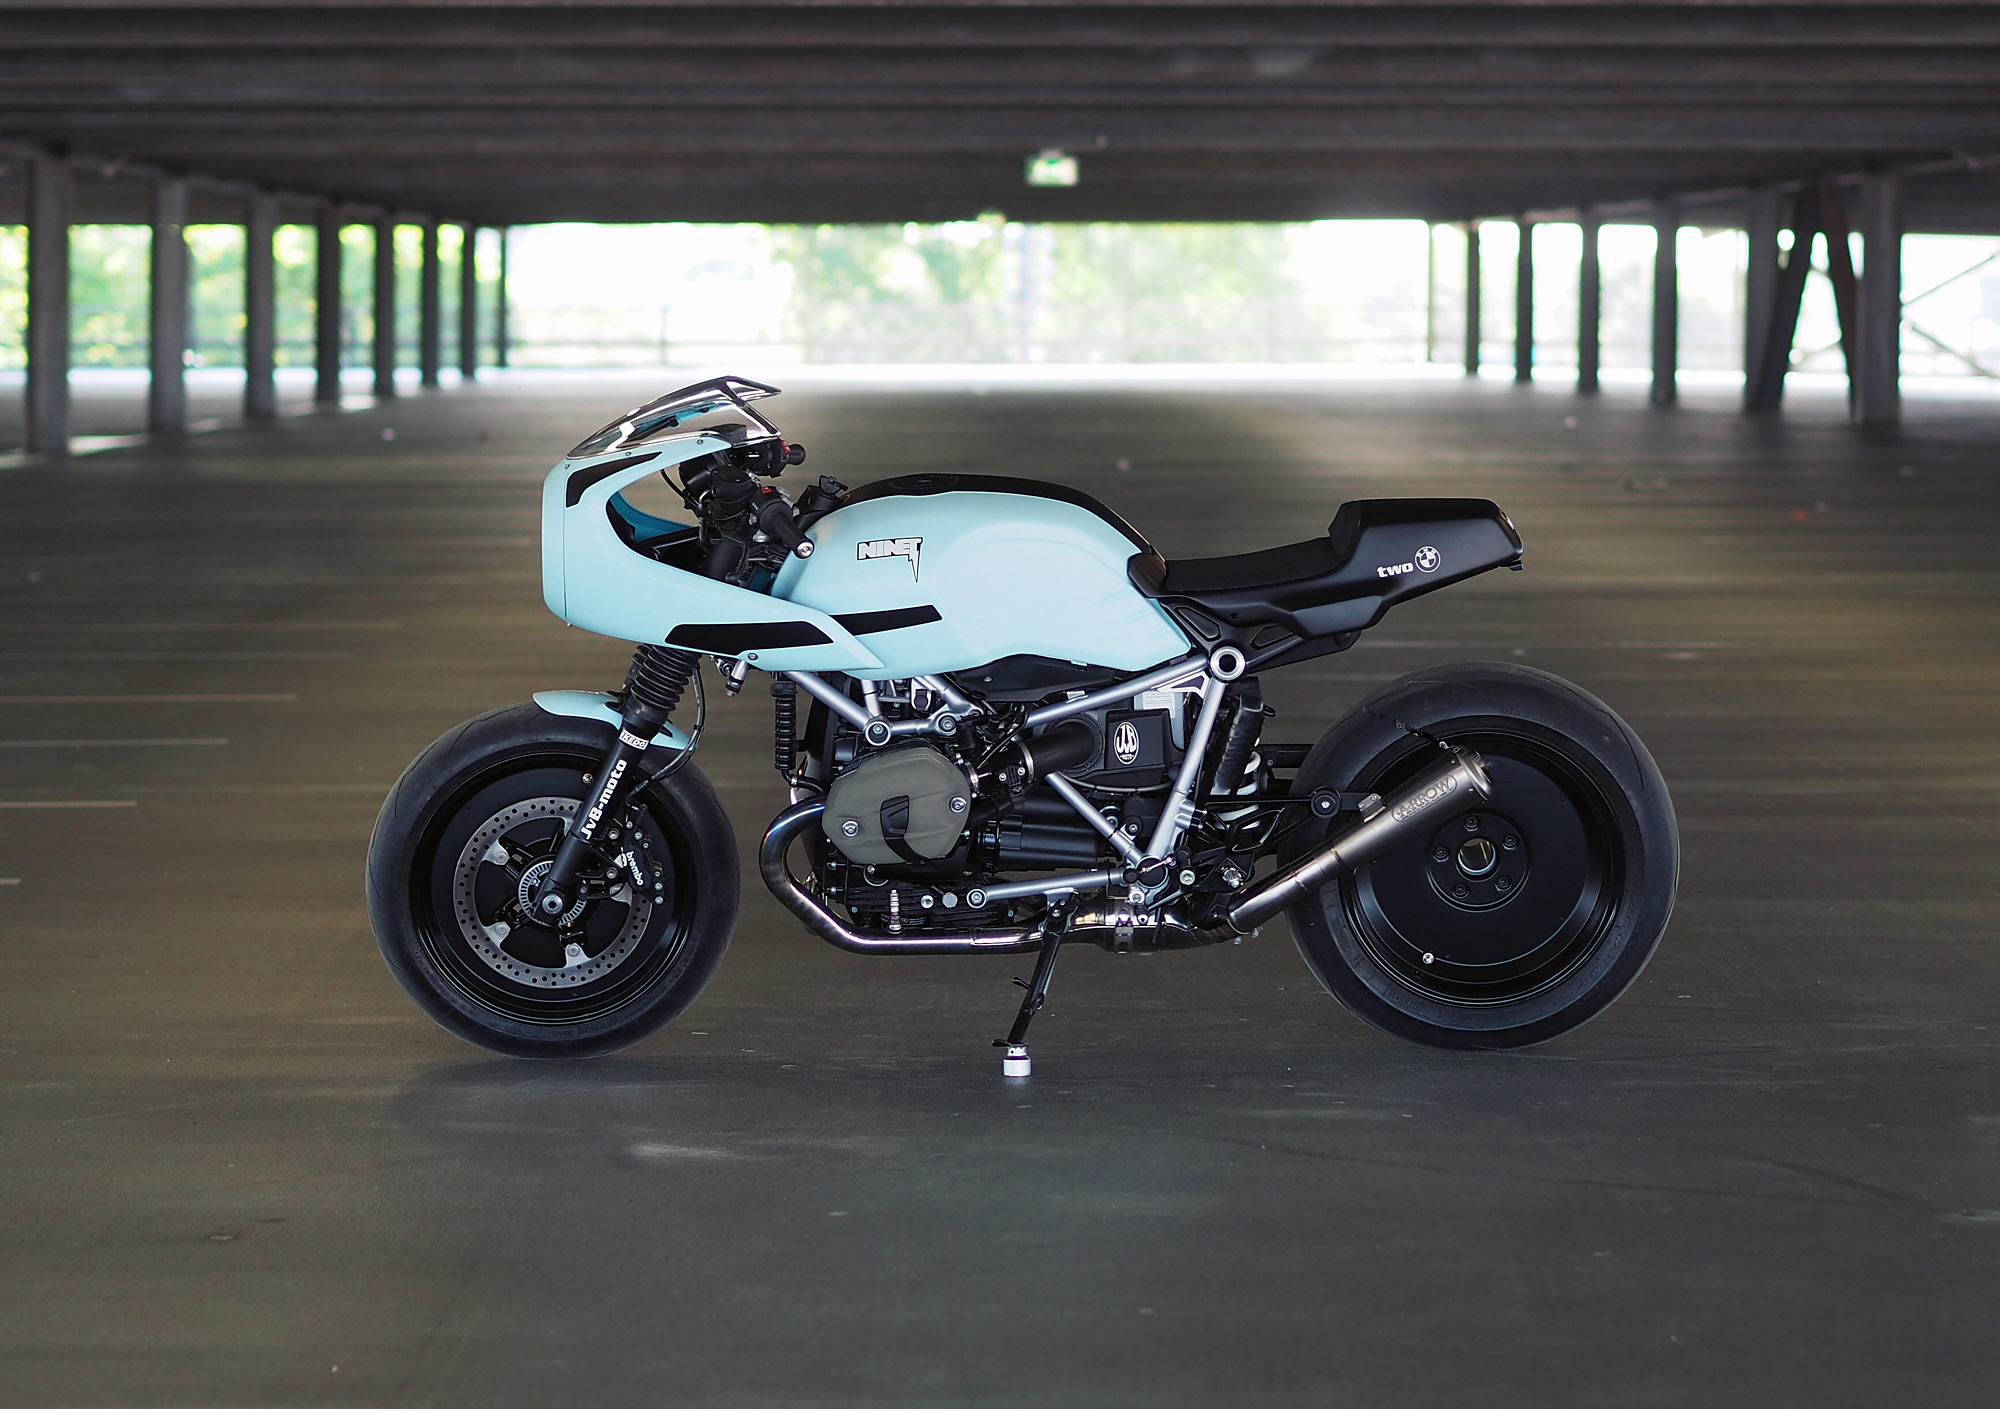 JVB_moto_BMW_RnineT_TWO_BIGS_04.jpg